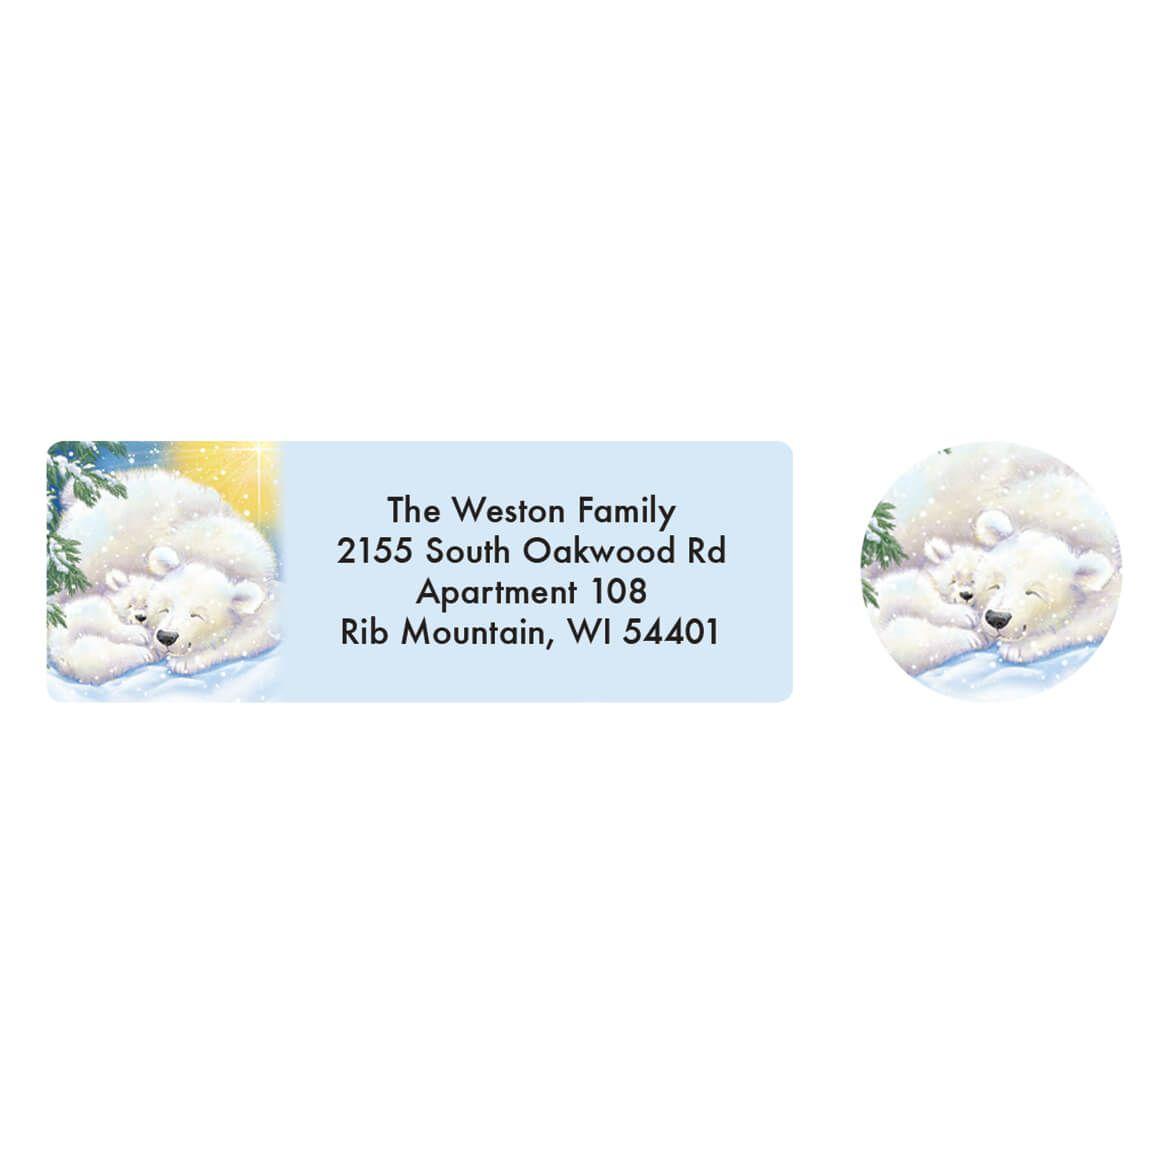 Personalized Light of Christ Address Labels & Envelope Seal 20-364762